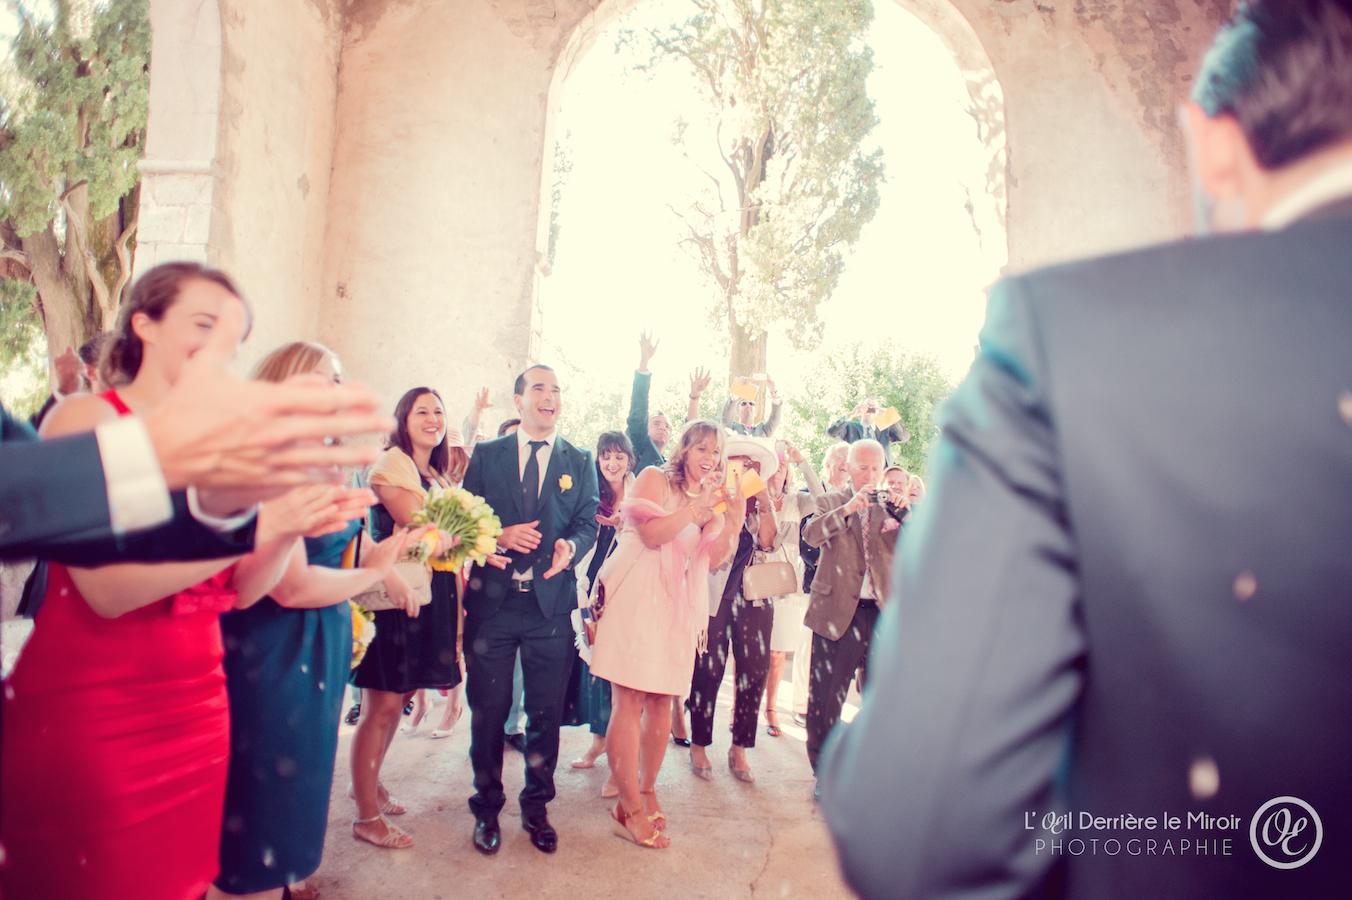 Photographe-Fayence-loeilderrierelemiroir-020